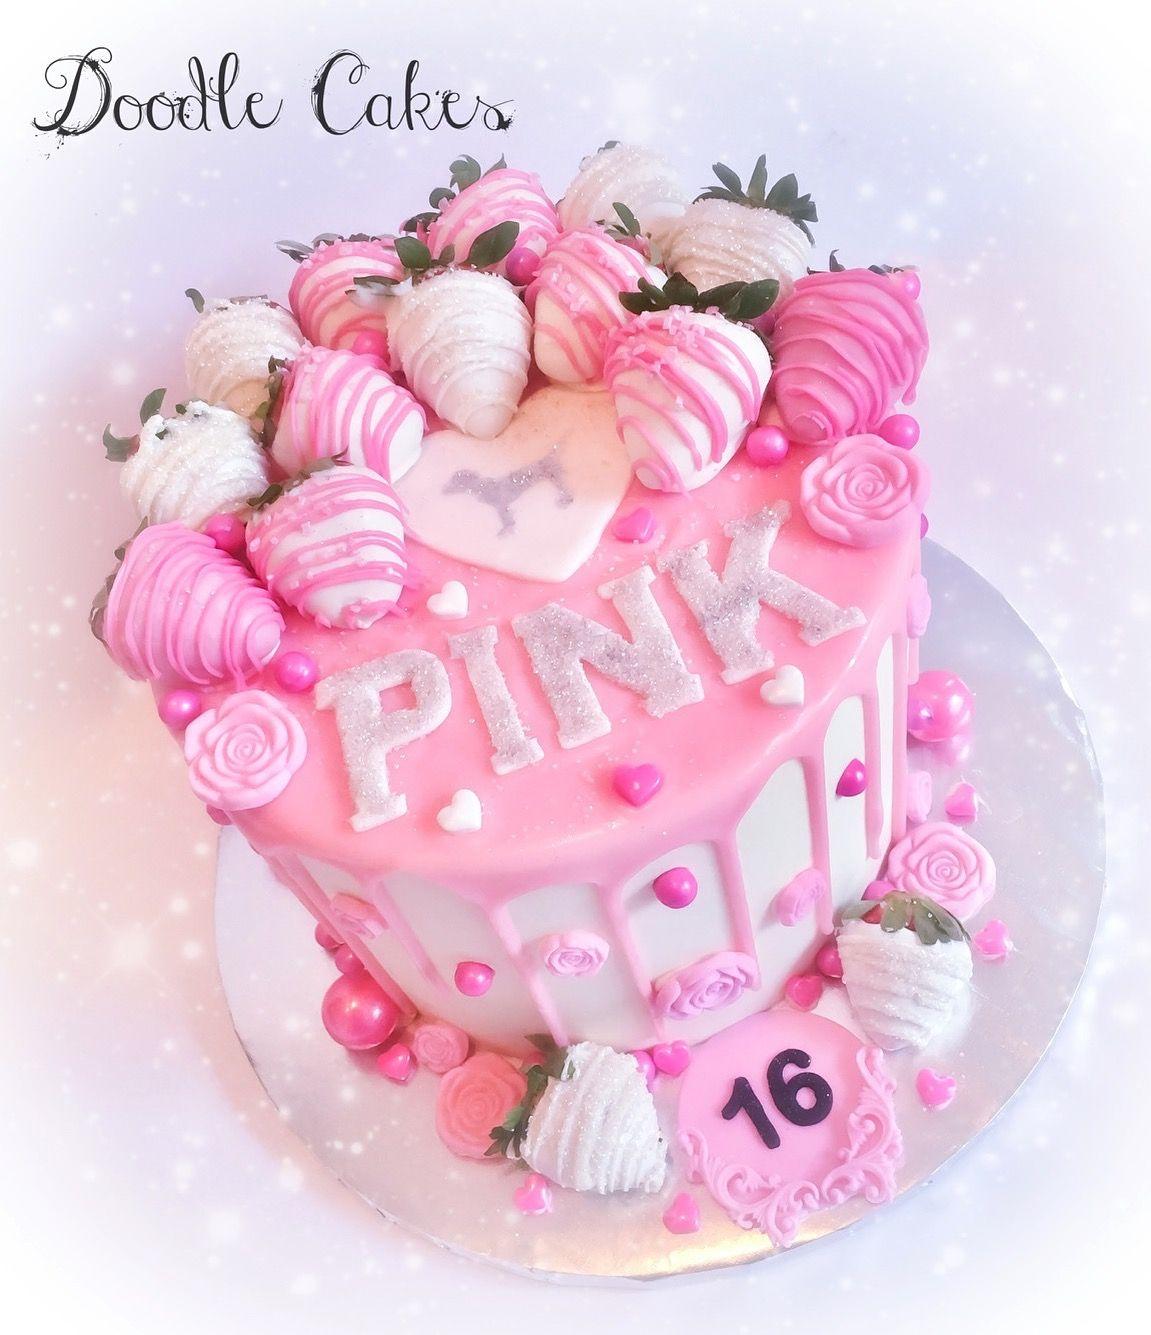 Victoria secret pink cake 14th birthday cakes doodle